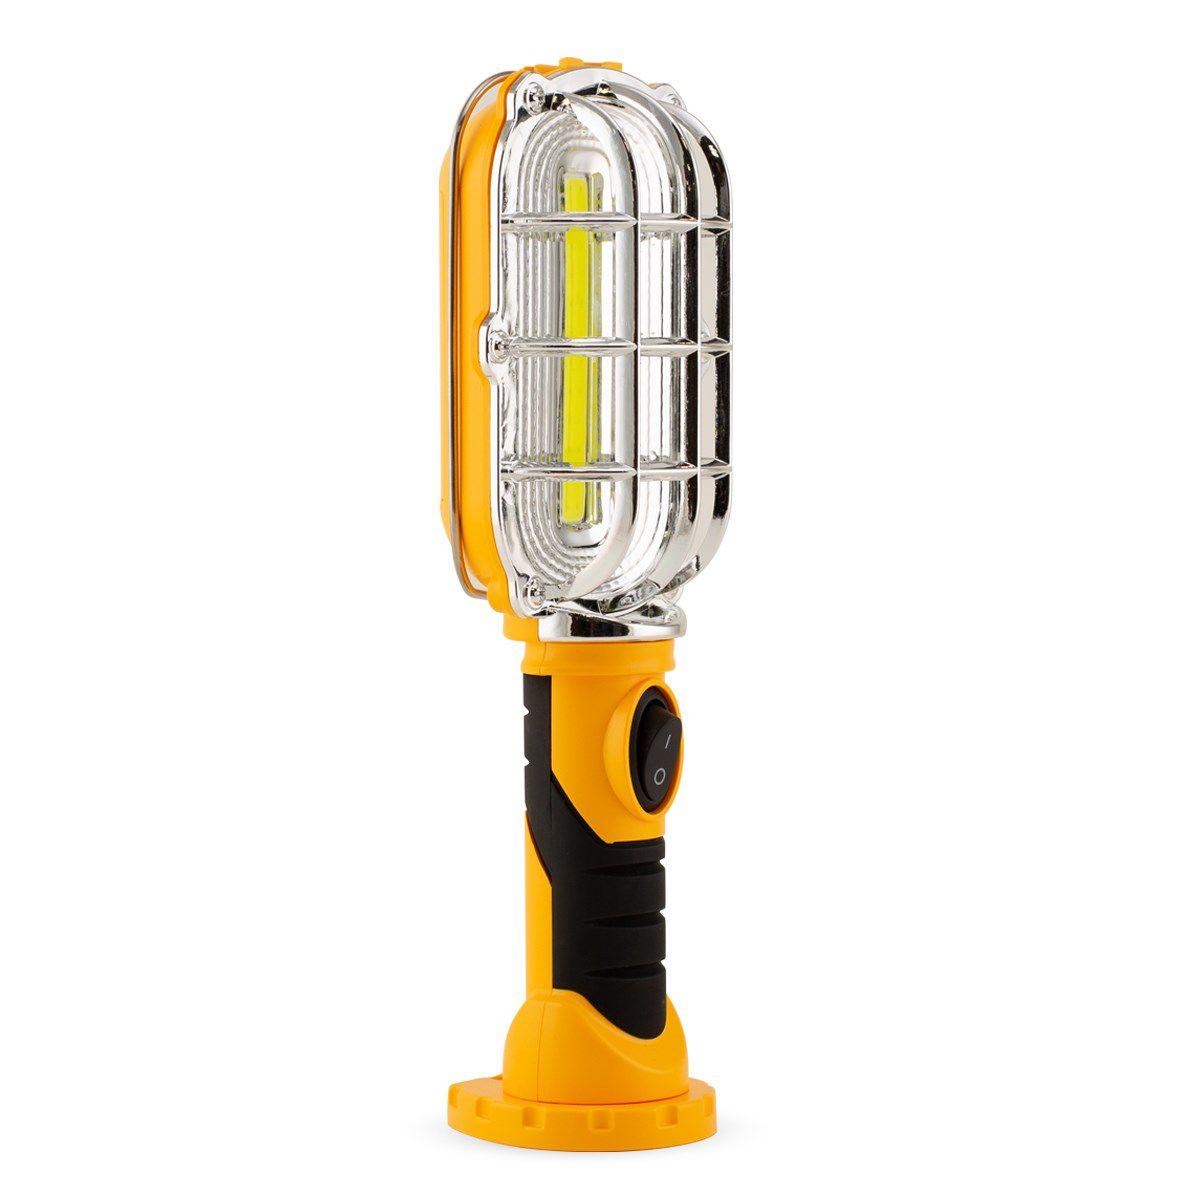 Lanterna Kit 15 unid Emergencia Mecanico Veicular Luminaria Led Carro Portatil